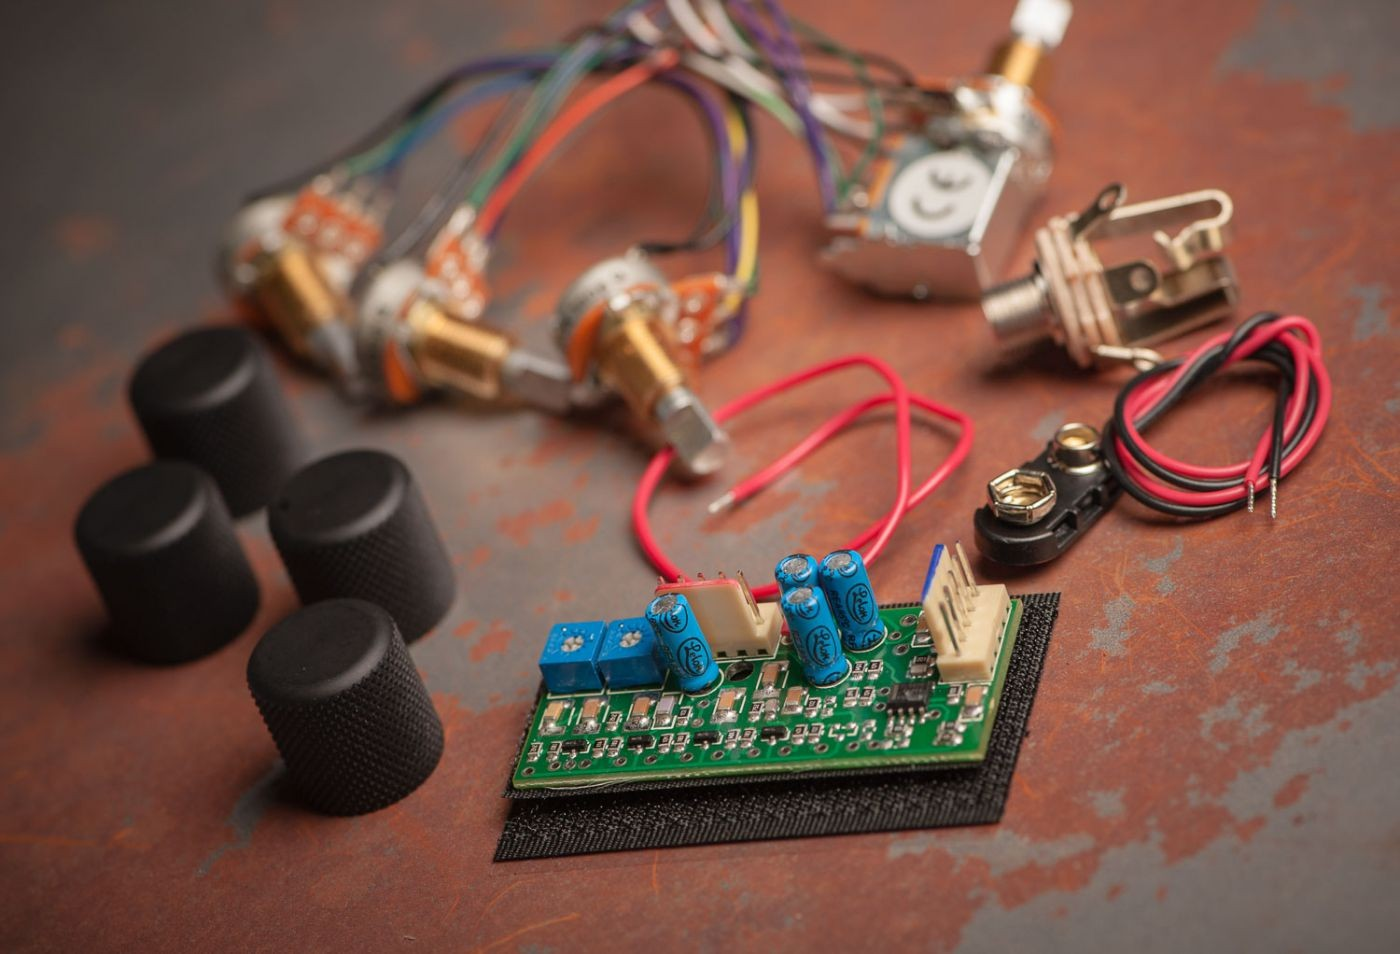 Seymour Duncan Stc-3m4 3 Band Tone Circuit